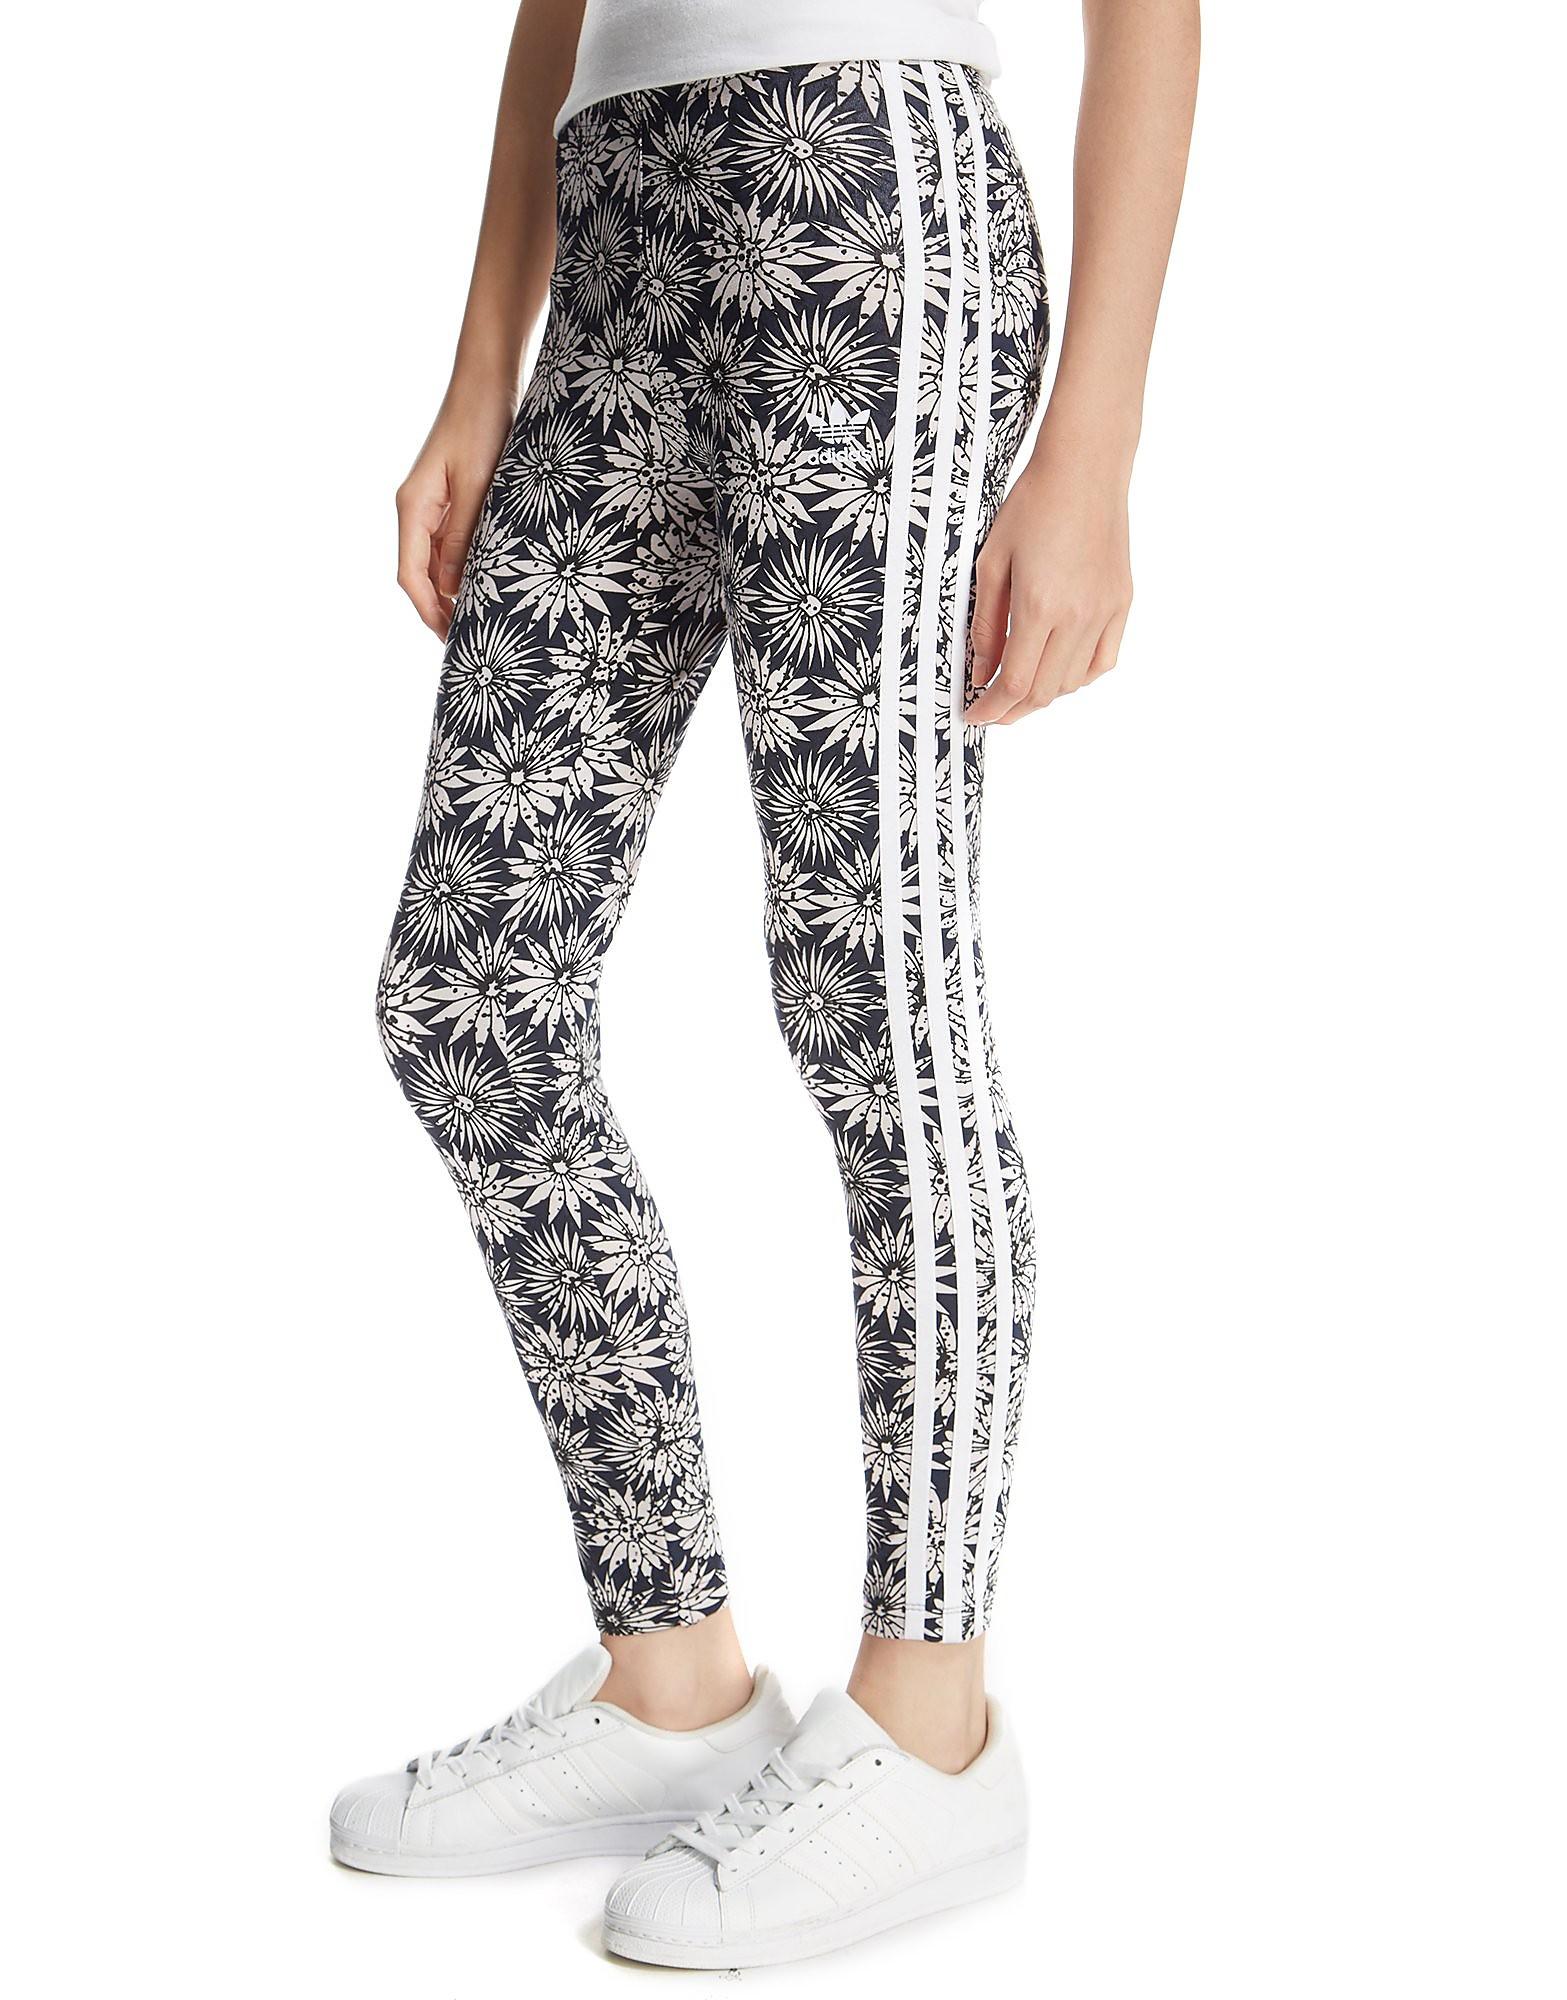 adidas Originals Girls' Daisy All-Over-Print Leggings Junior